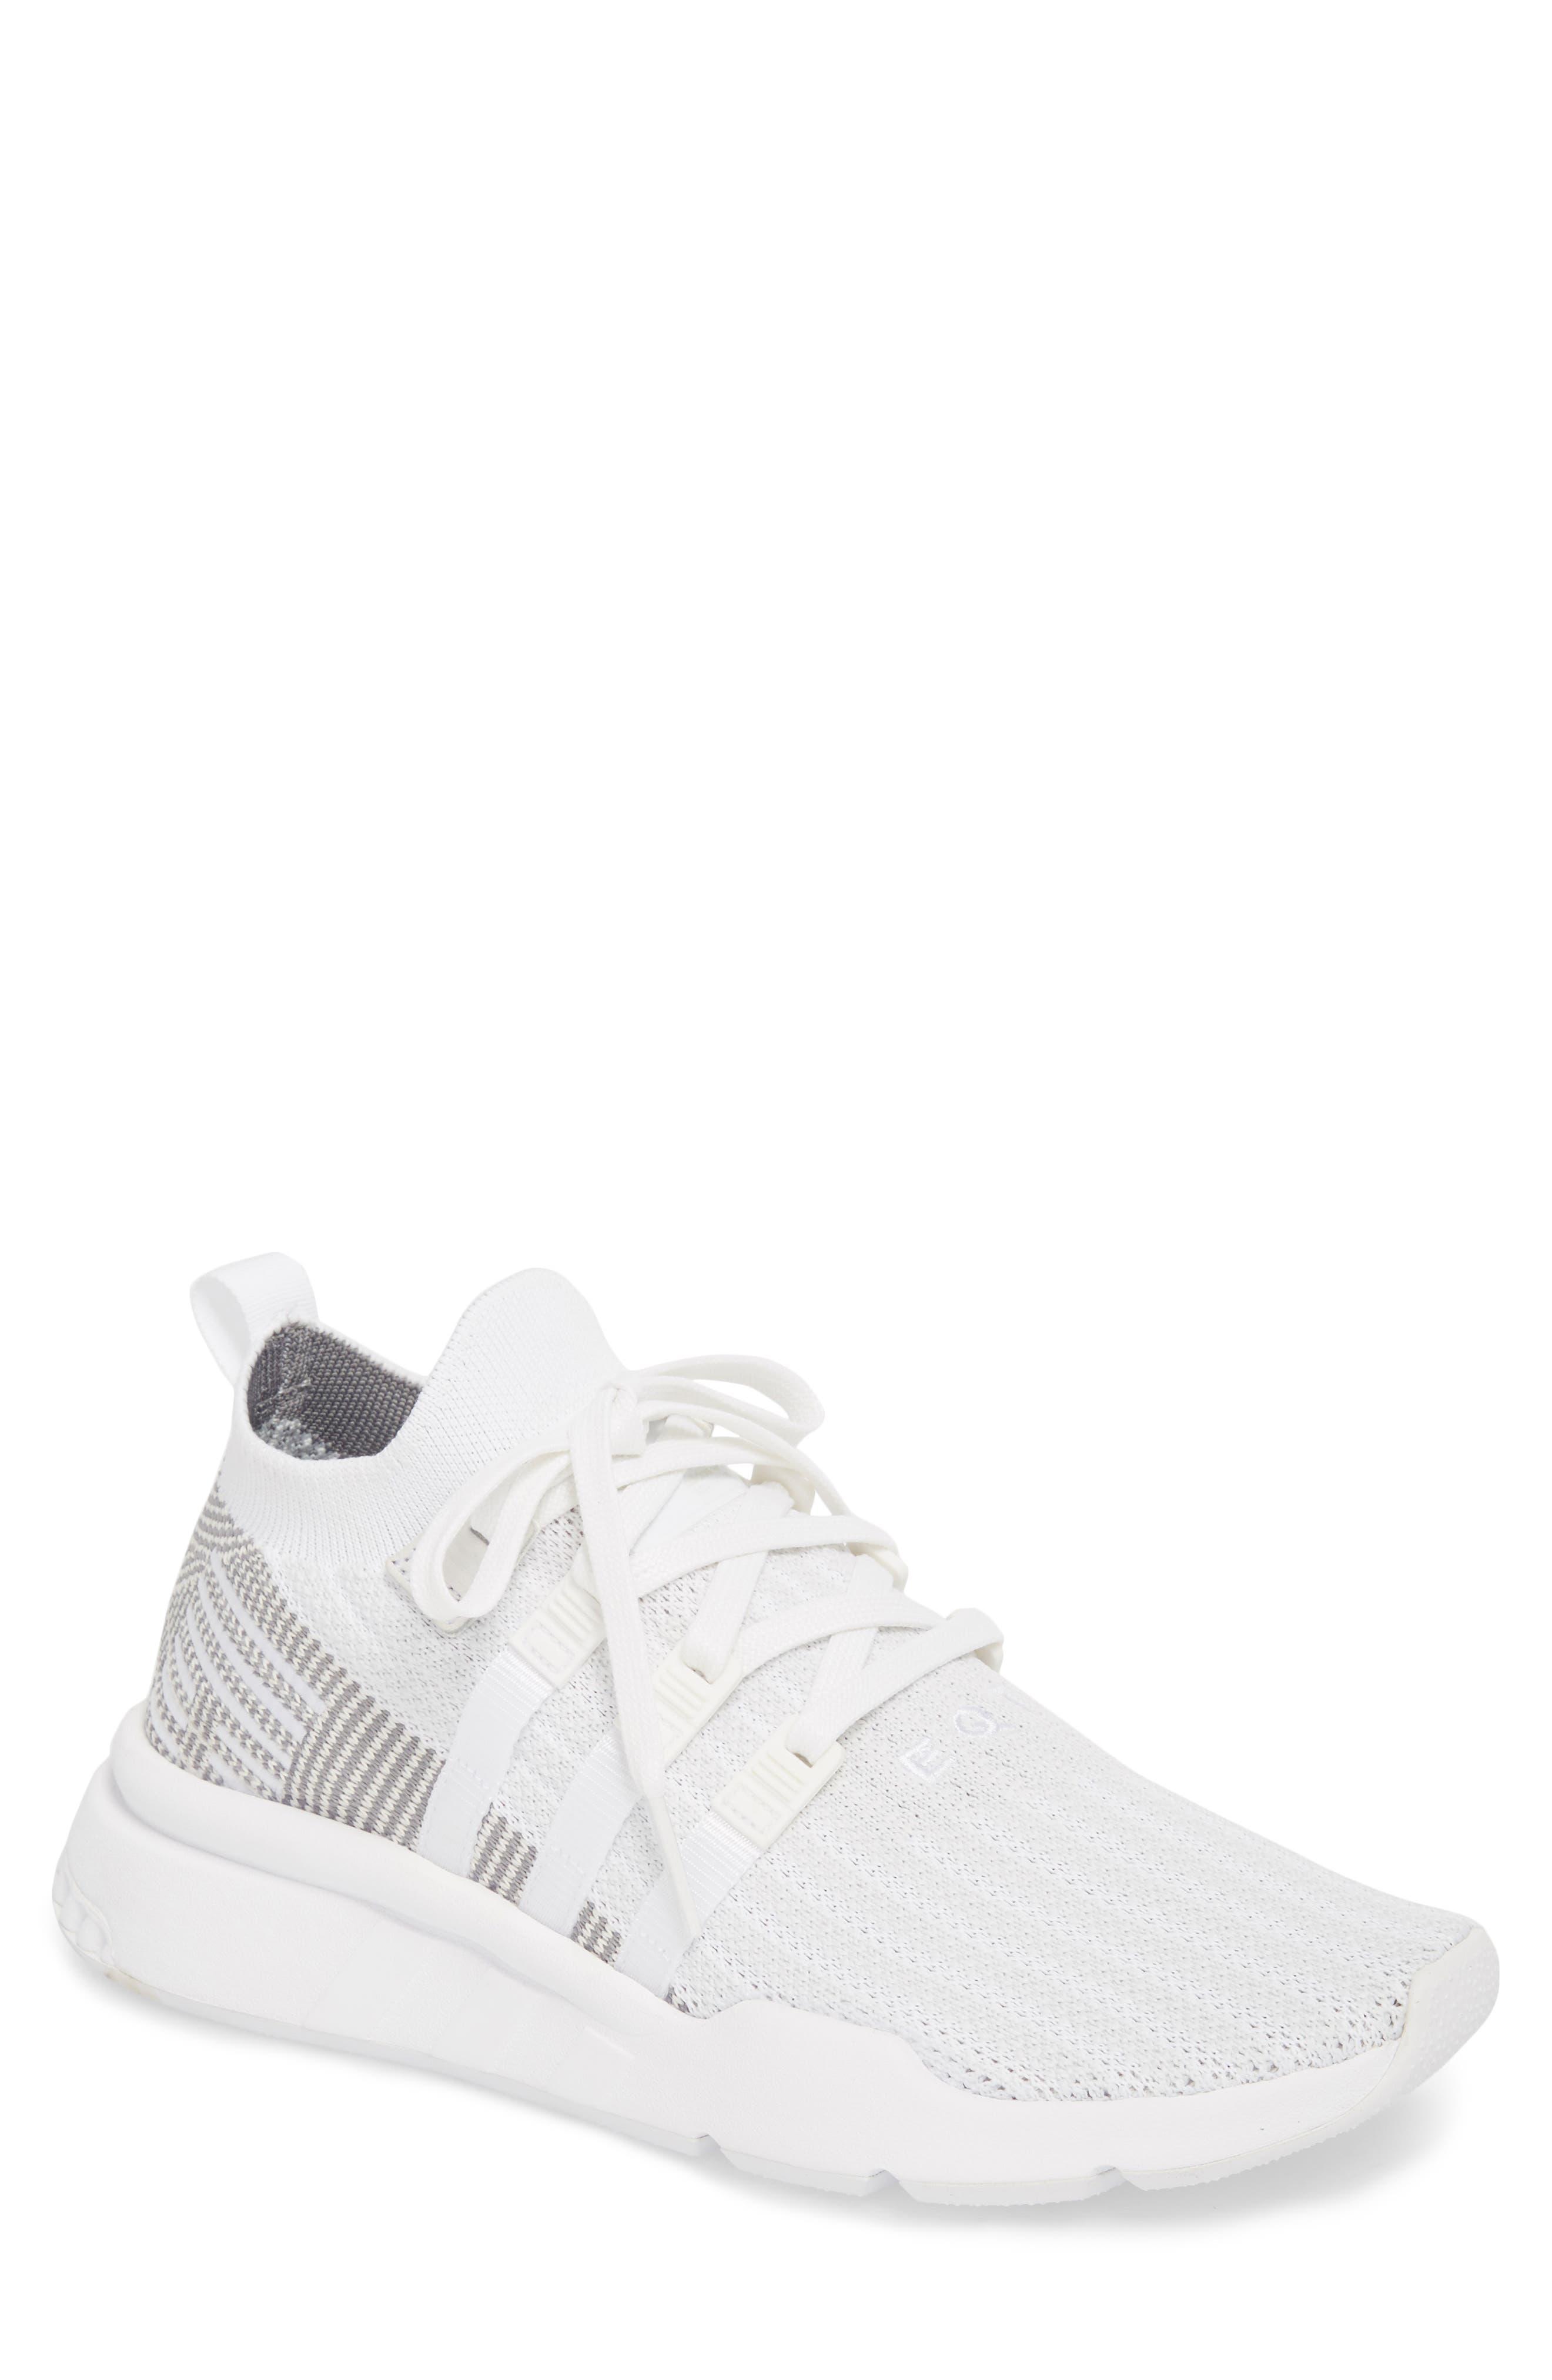 EQT Support Mid ADV Primeknit Sneaker,                             Main thumbnail 1, color,                             WHITE/ WHITE/ GREY